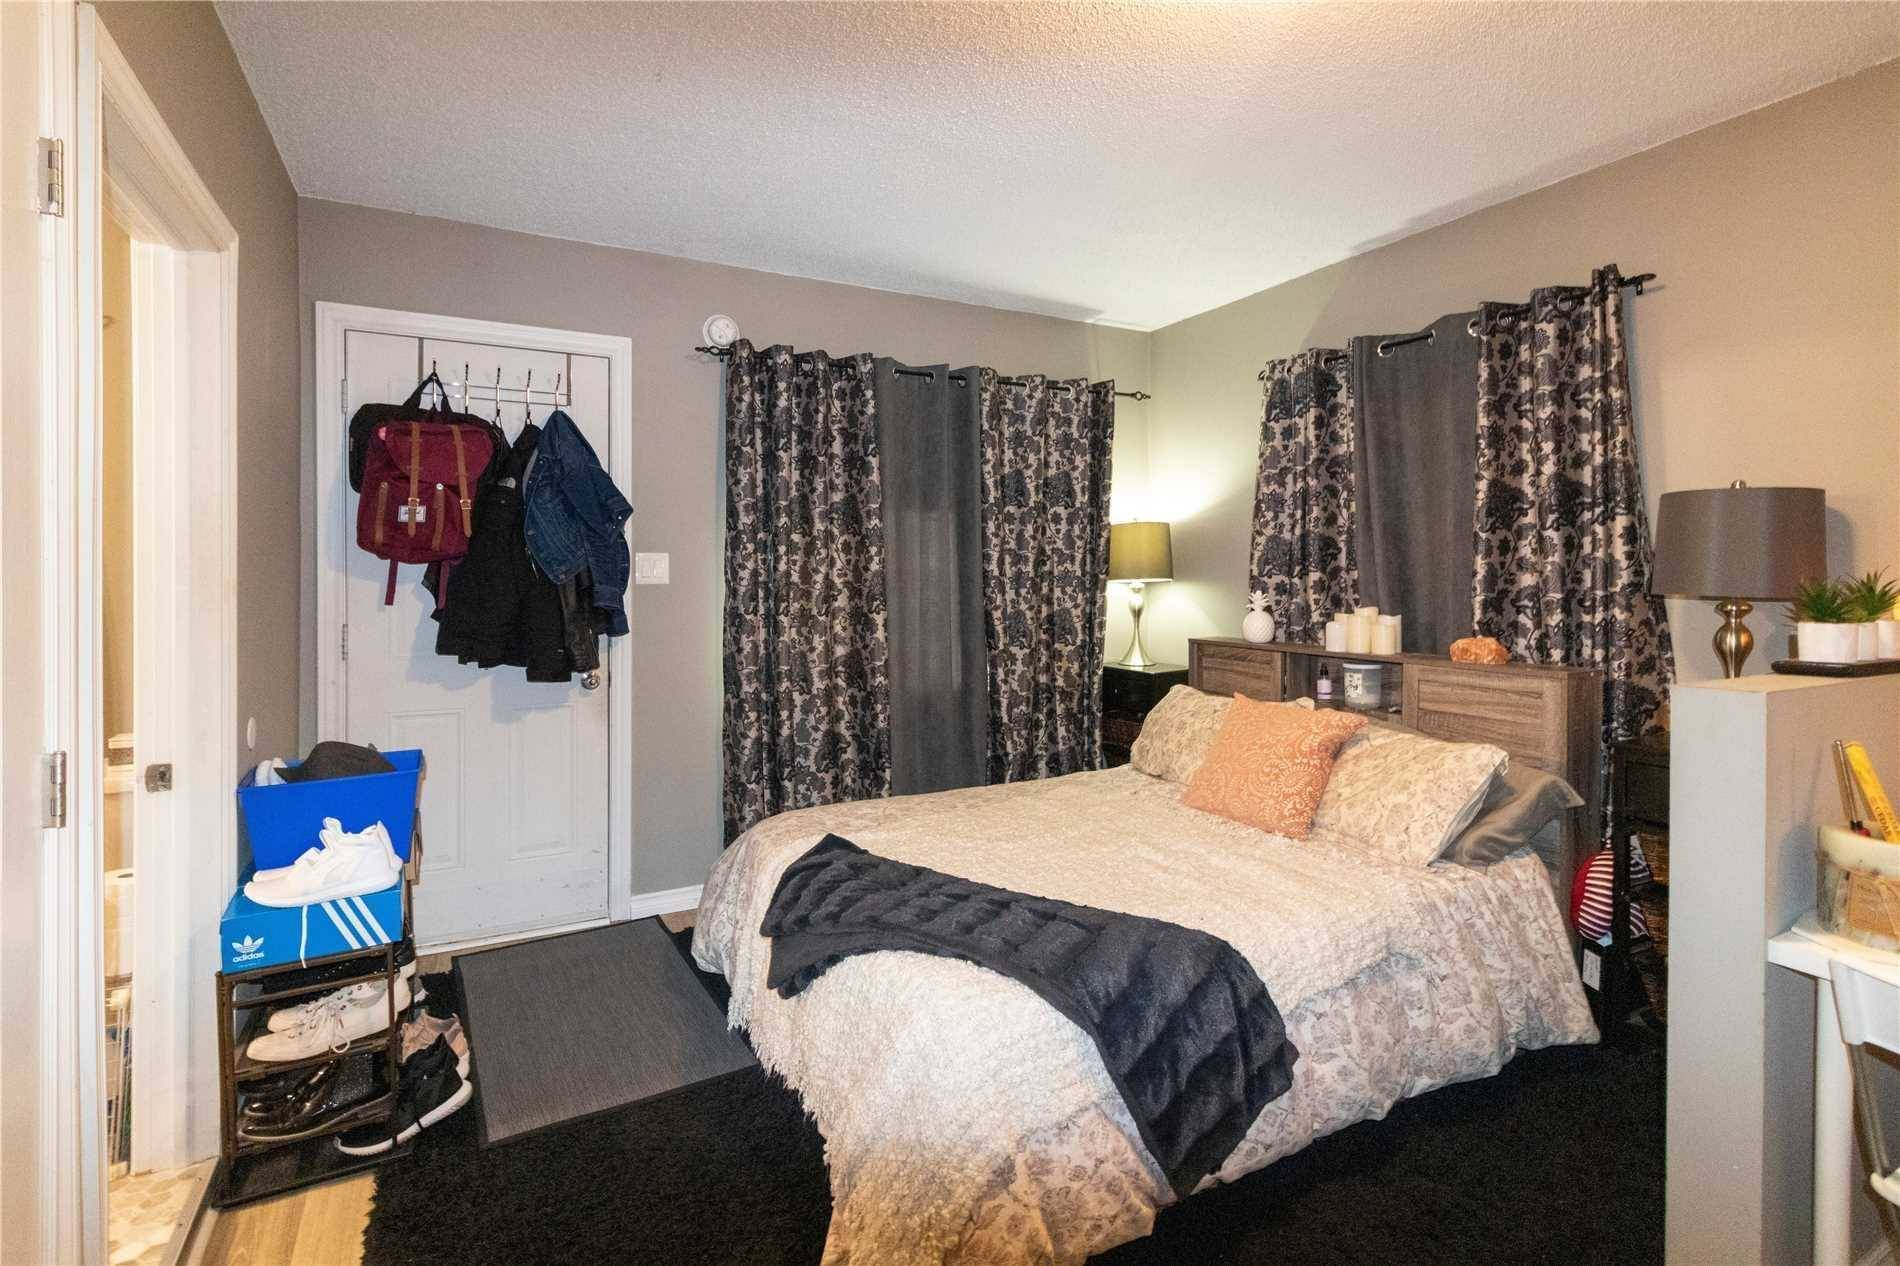 House for sale at 272 Haig St Oshawa Ontario - MLS: E4623495